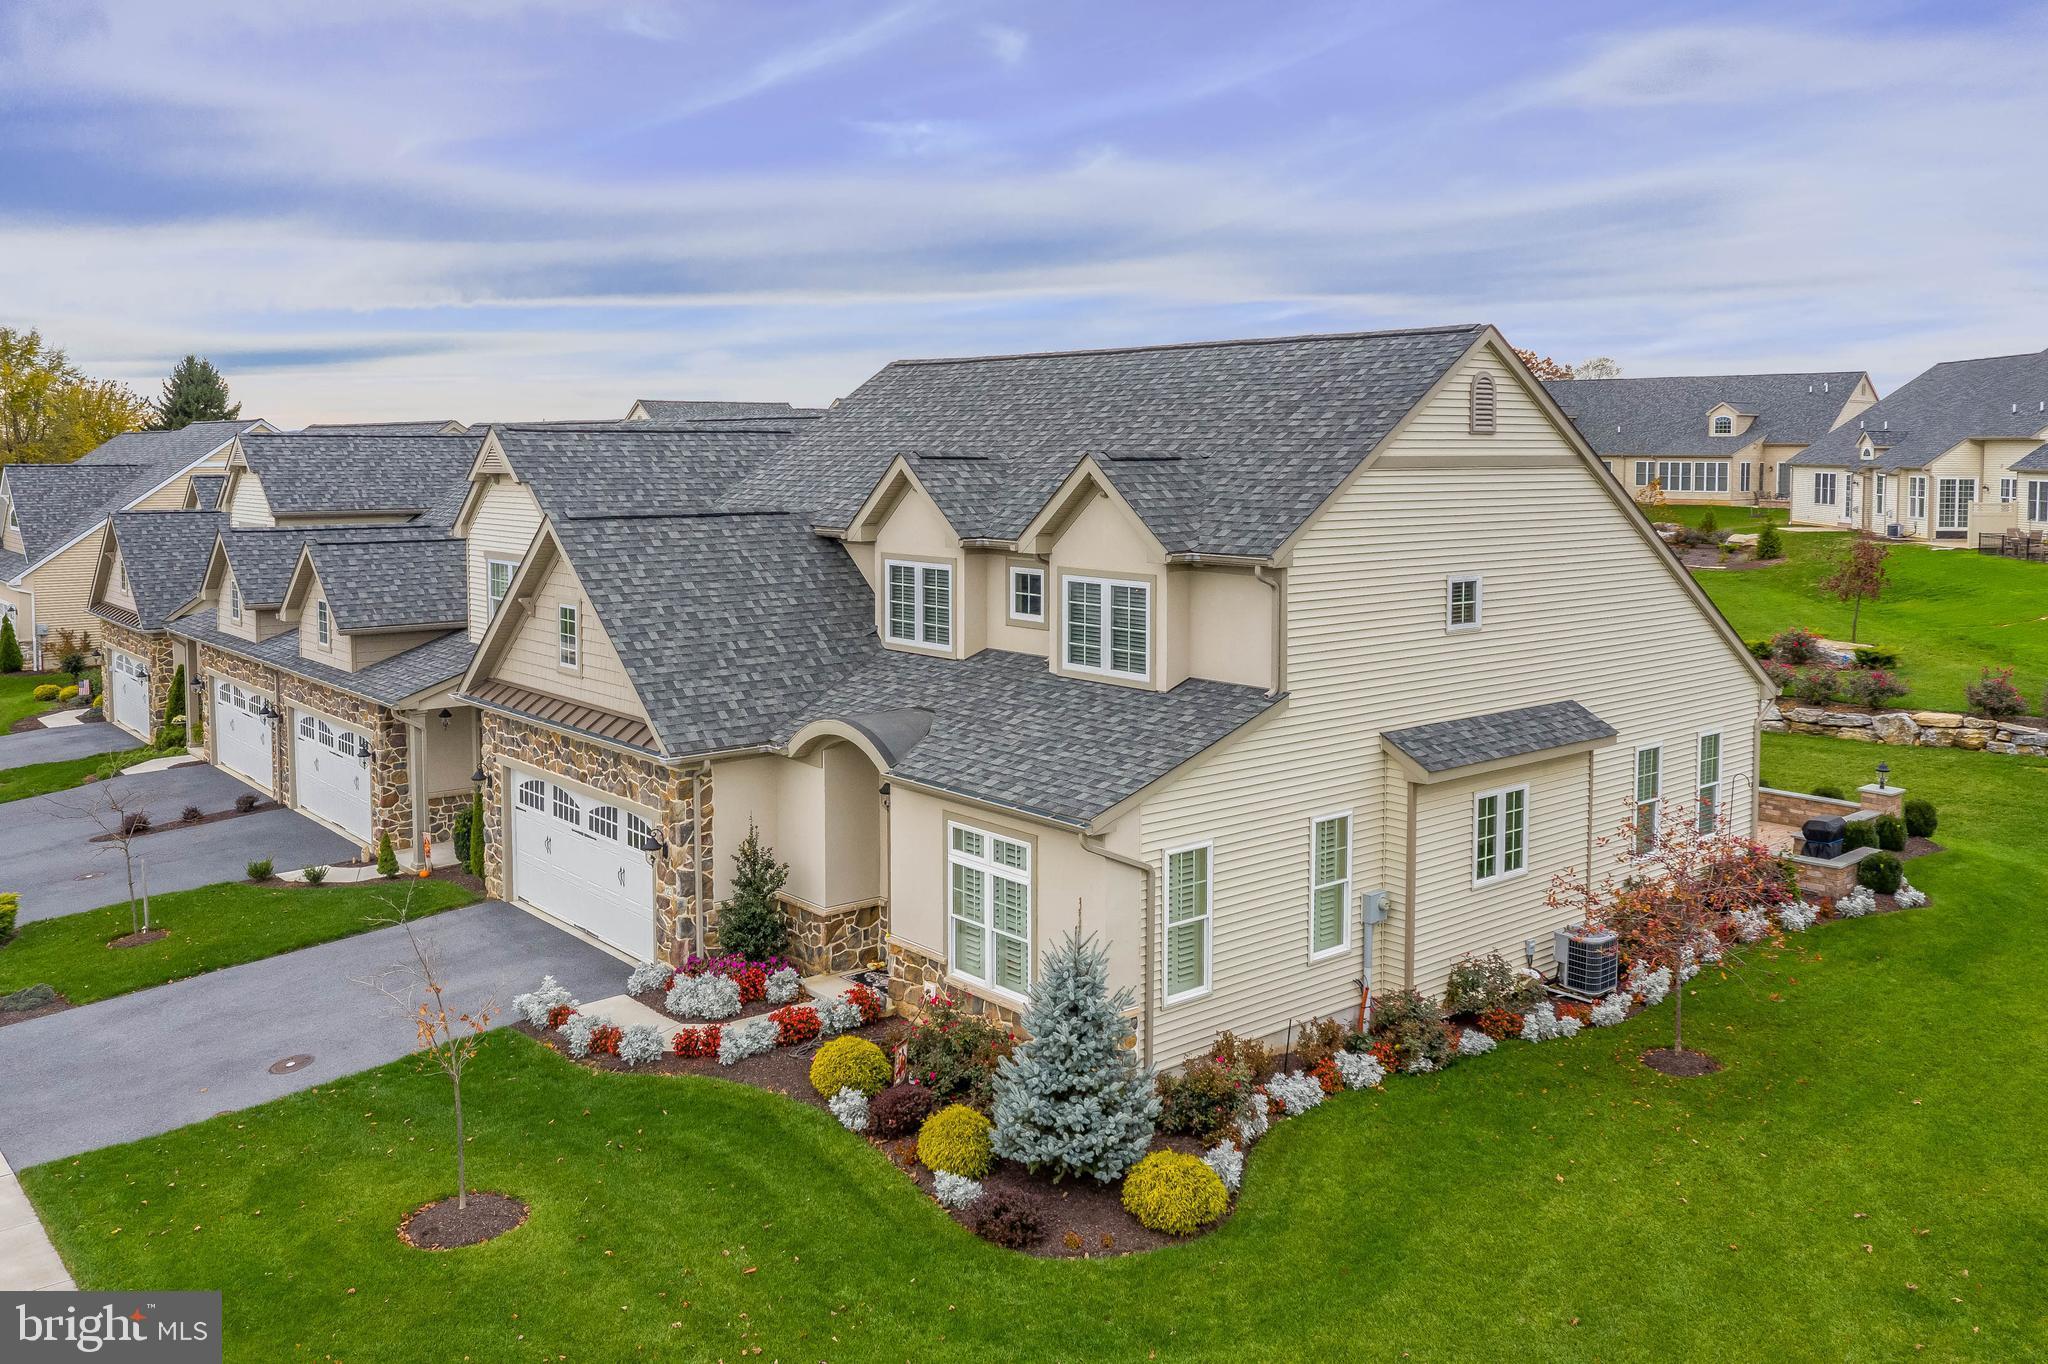 Aerial community picture